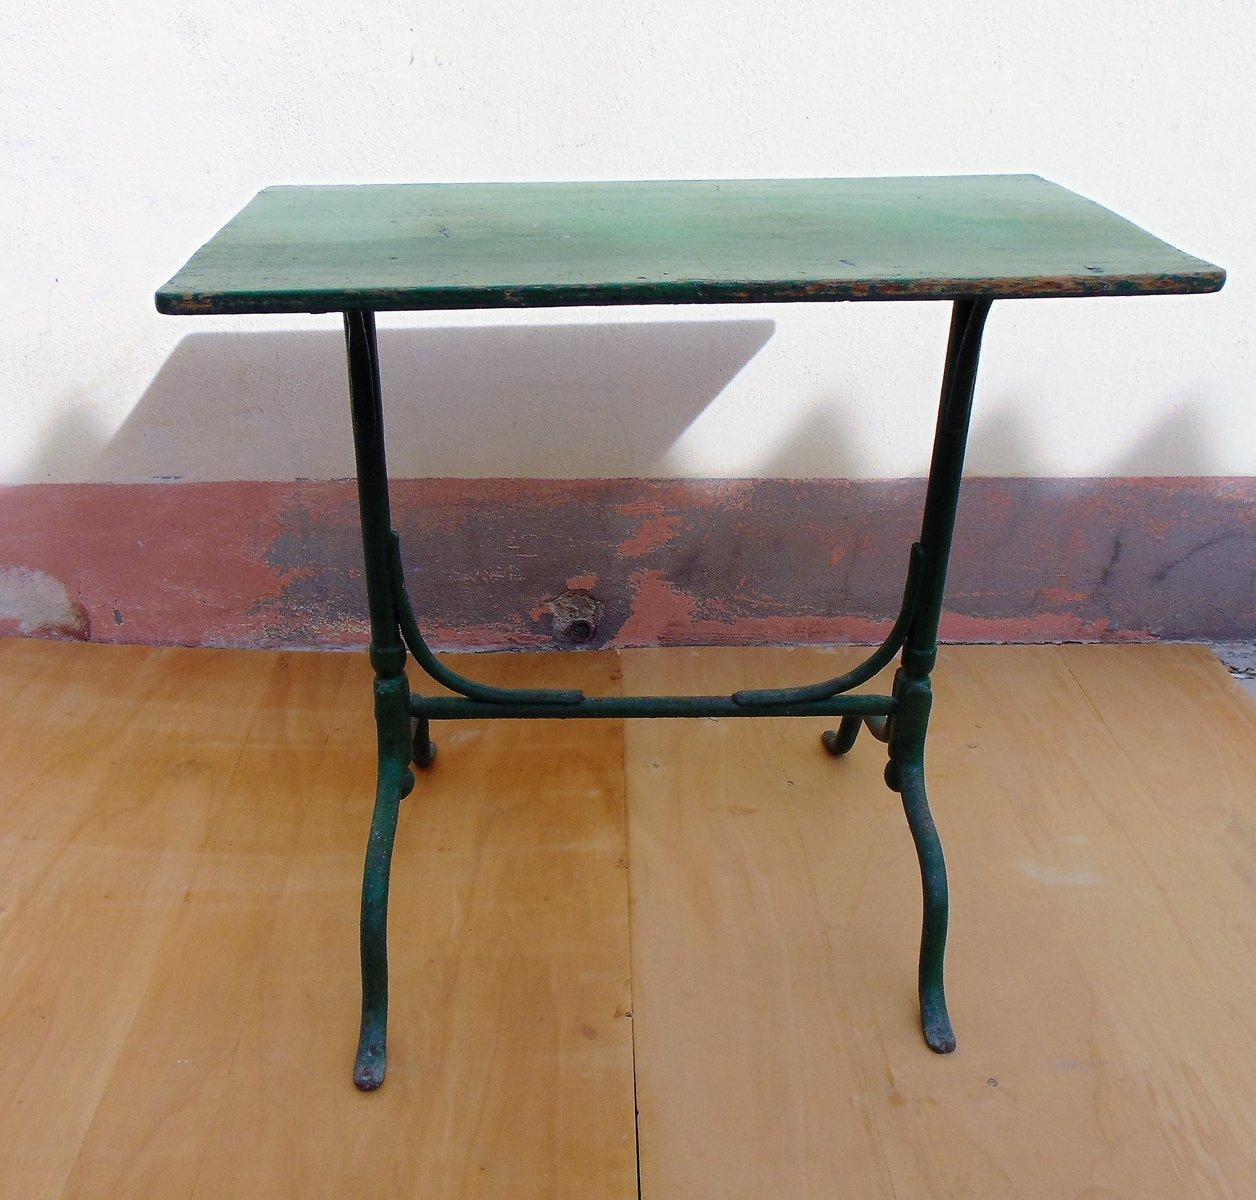 table de jardin vintage en fer et bois en vente sur pamono. Black Bedroom Furniture Sets. Home Design Ideas